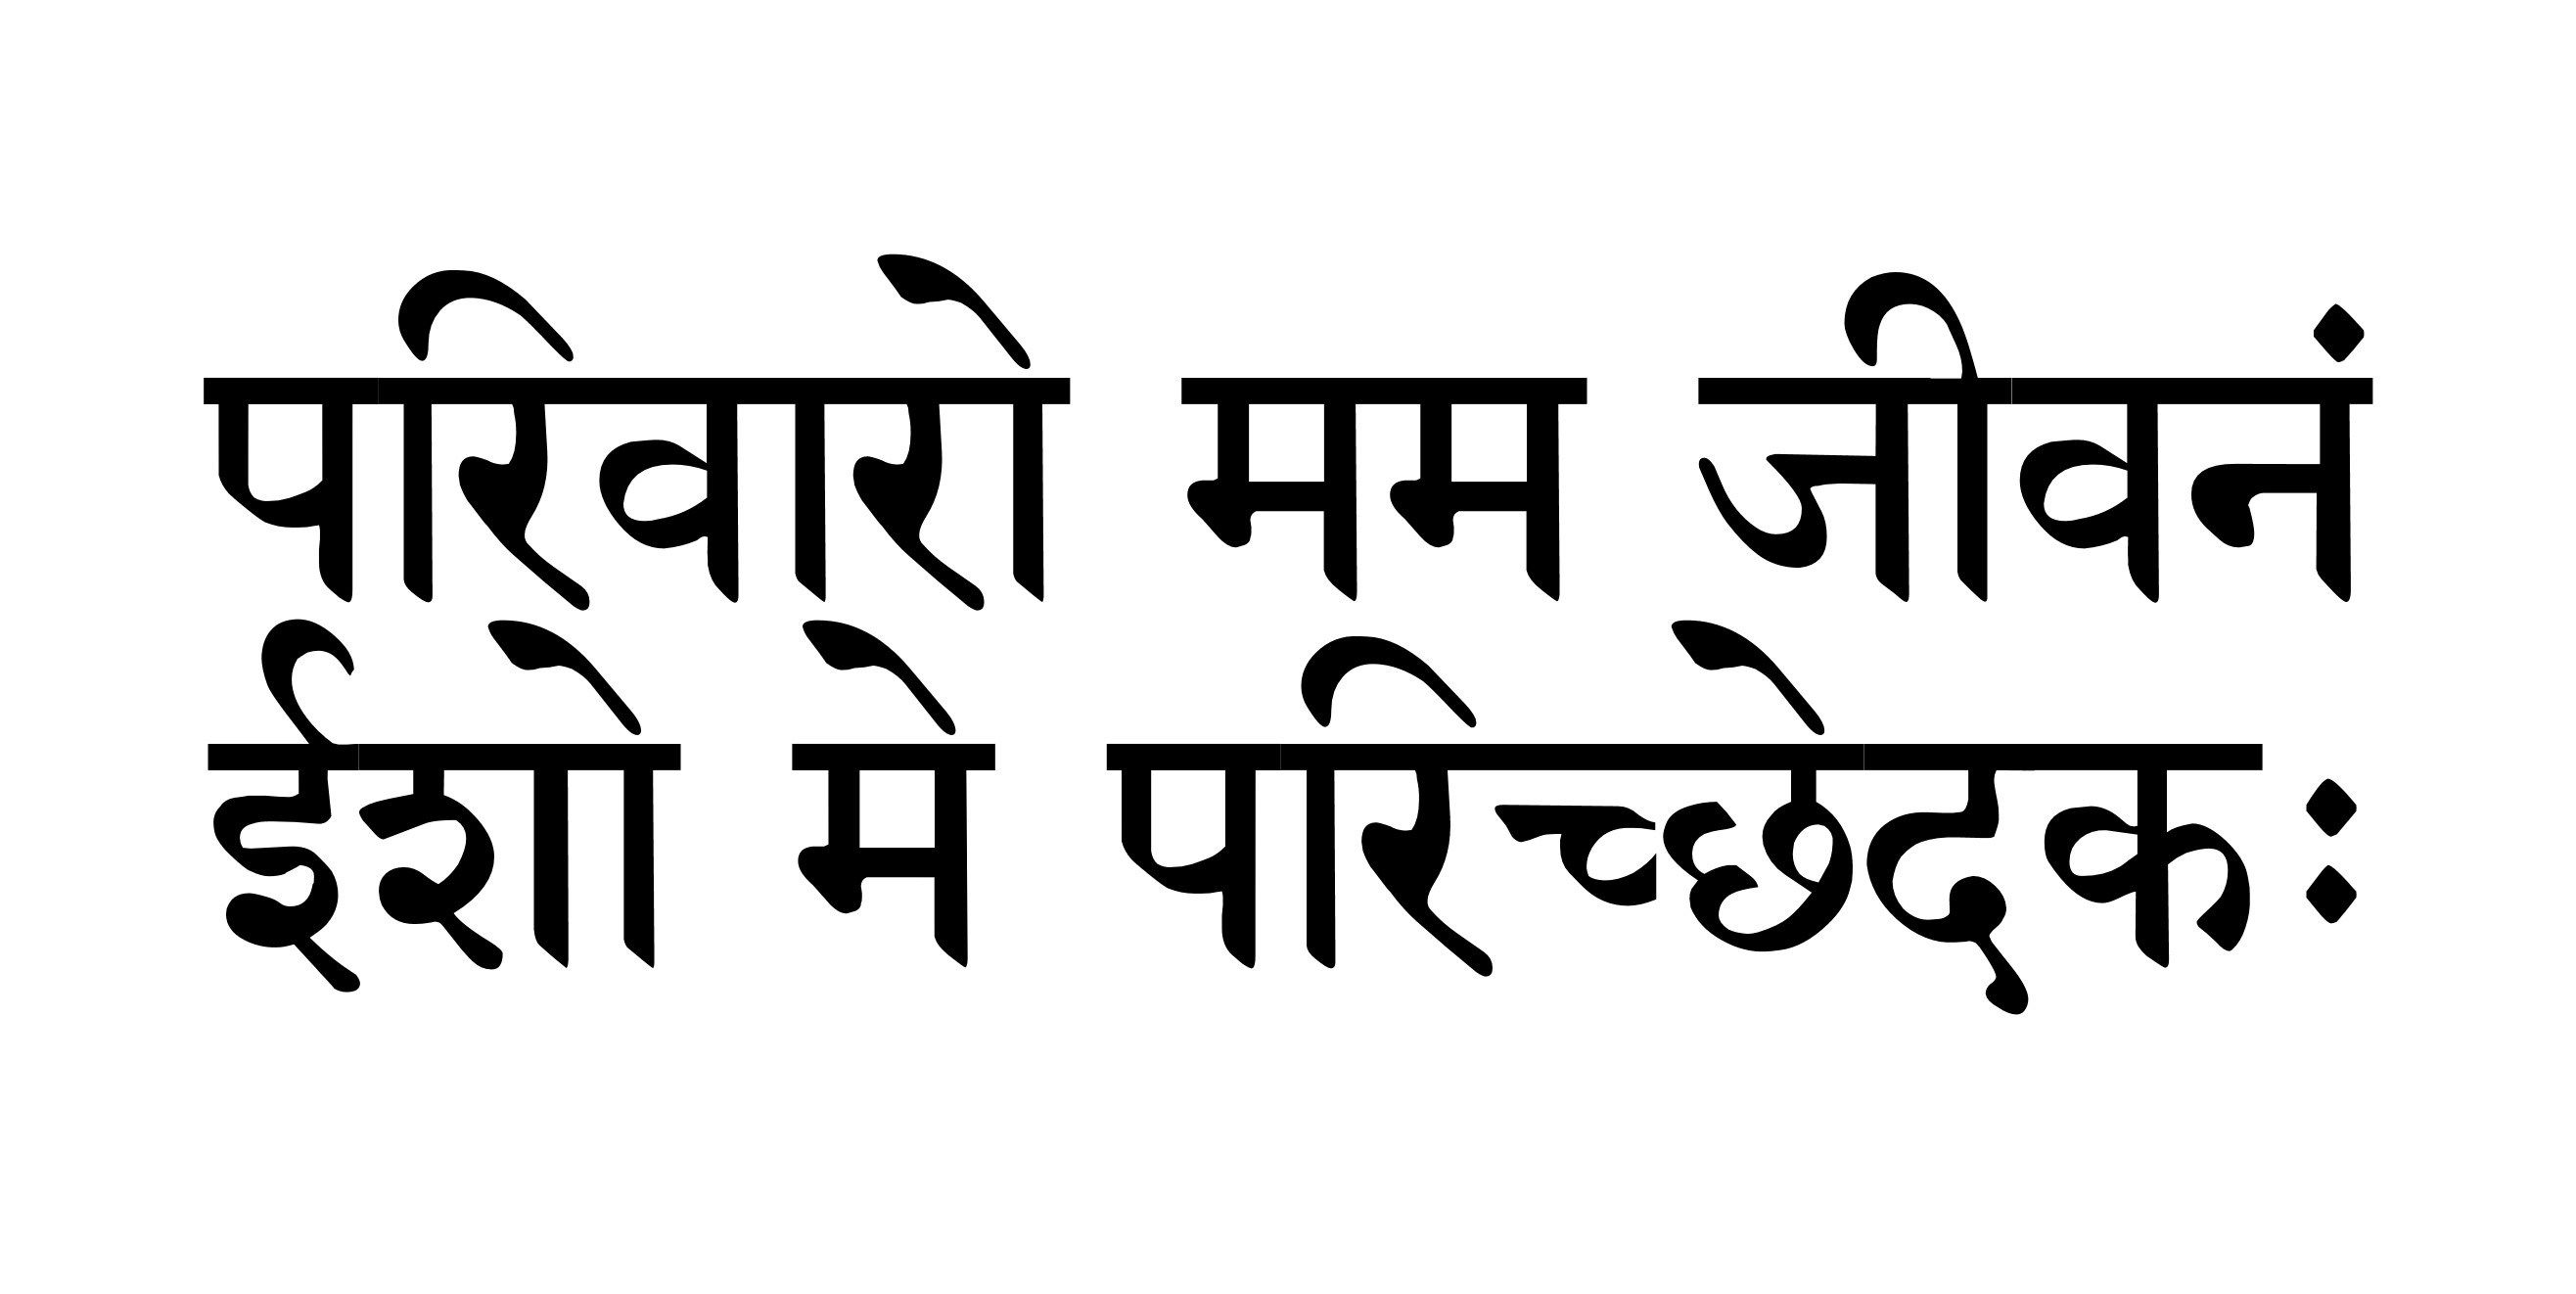 Sanskrit Tattoo Translation of the Phrase Family Is My Life ...